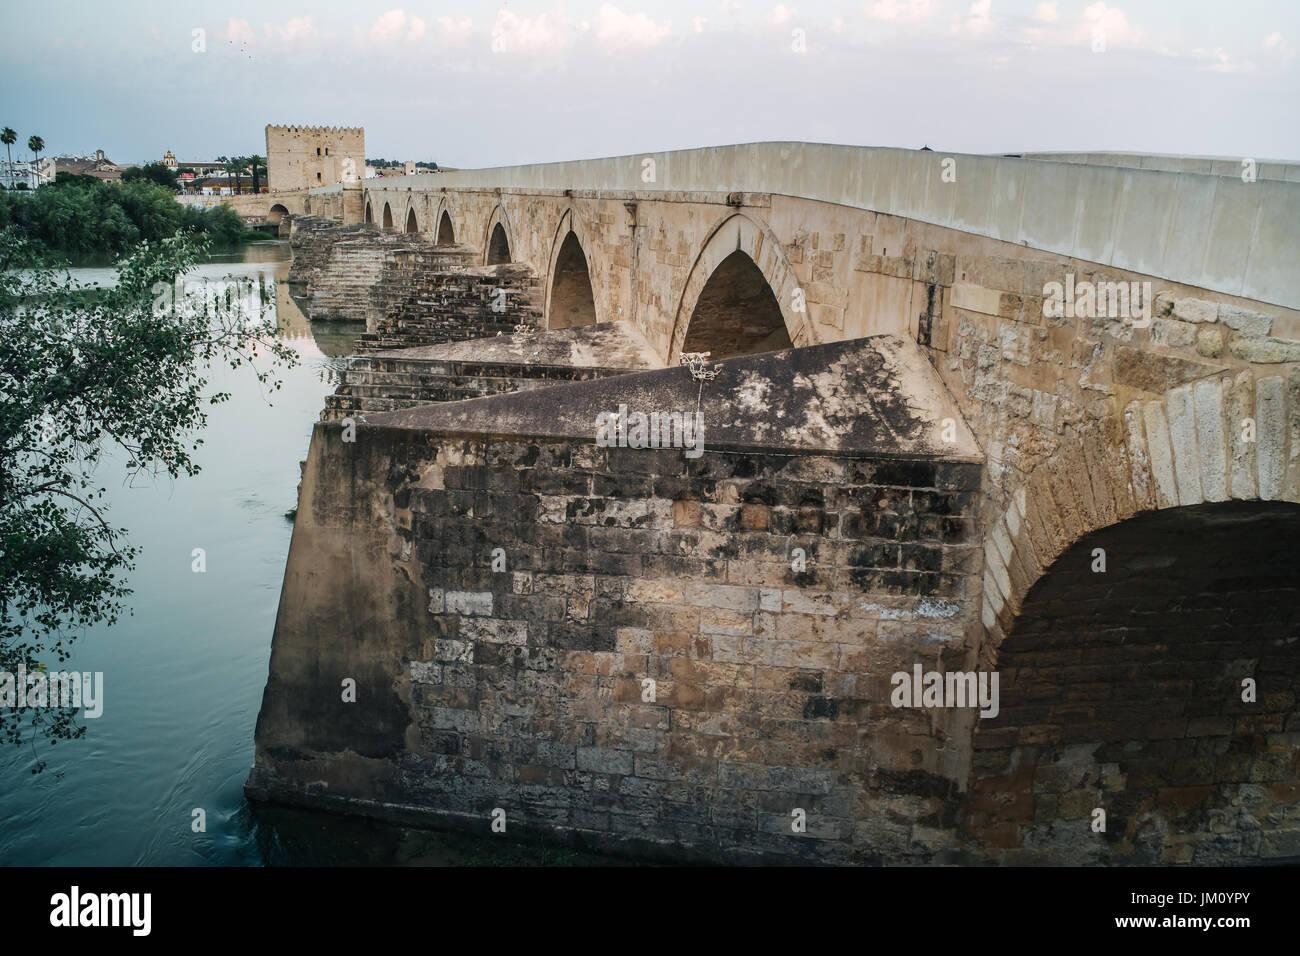 The wonderful Roman bridge and the Mezquita in Cordoba, Spain - Stock Image